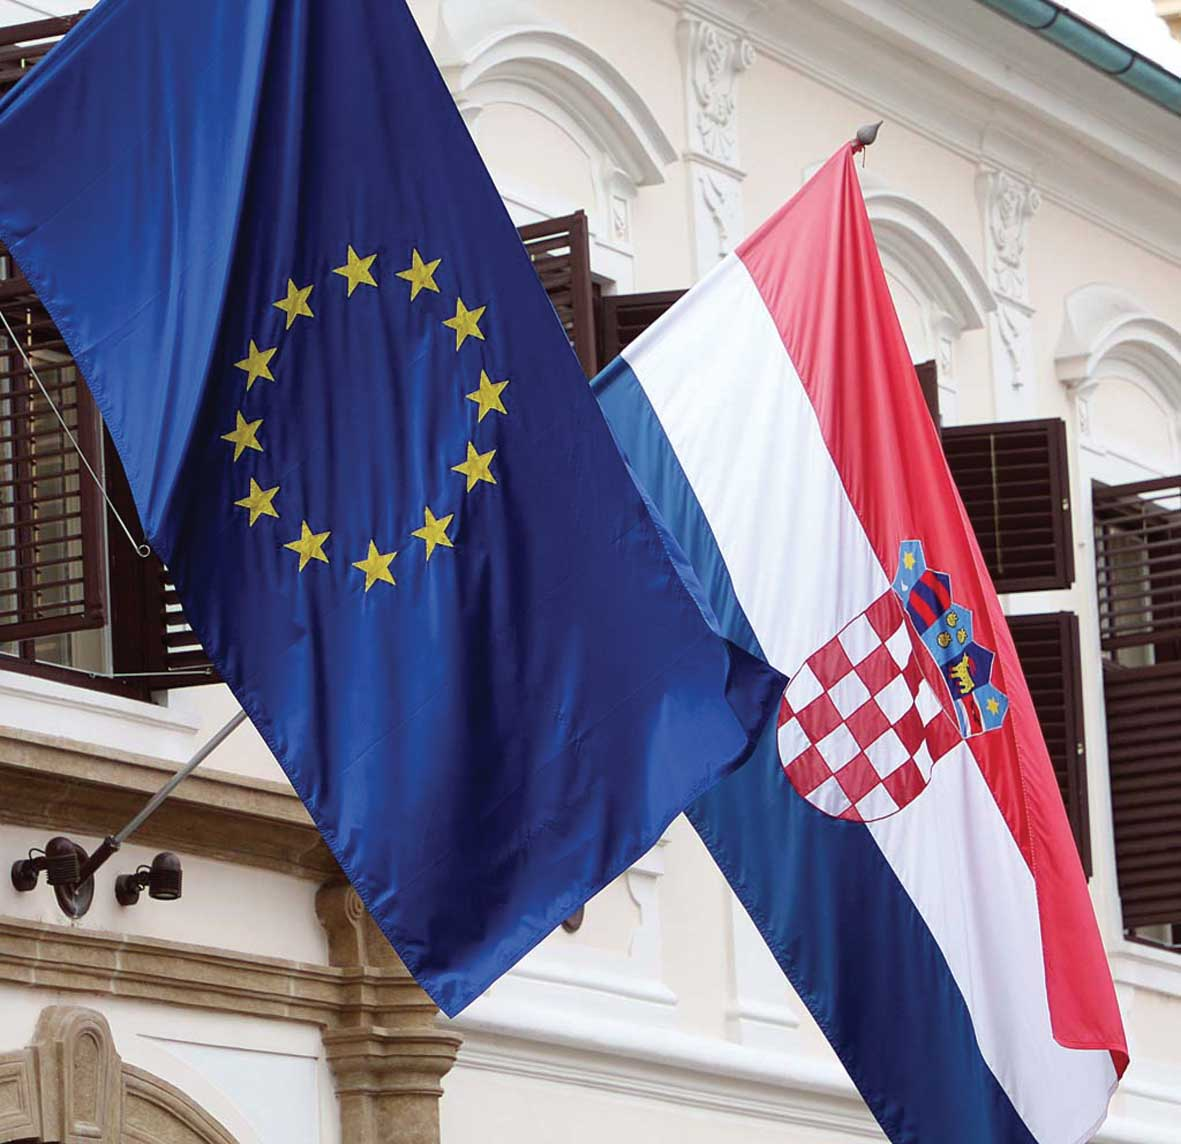 bandiera croata e europea 1